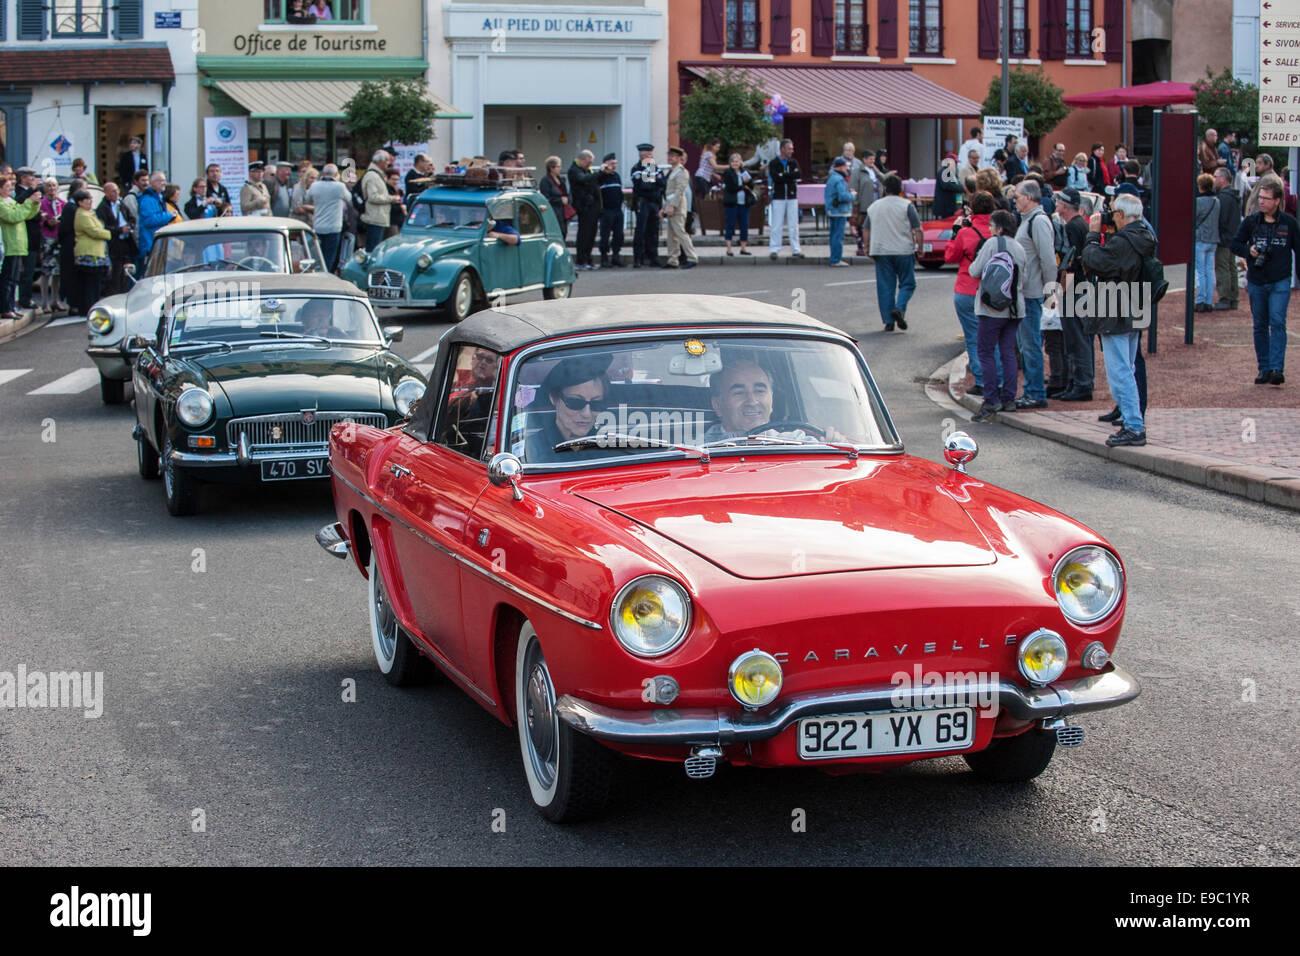 Classic cars during Embouteillage de la Route Nationale 7, event for ...